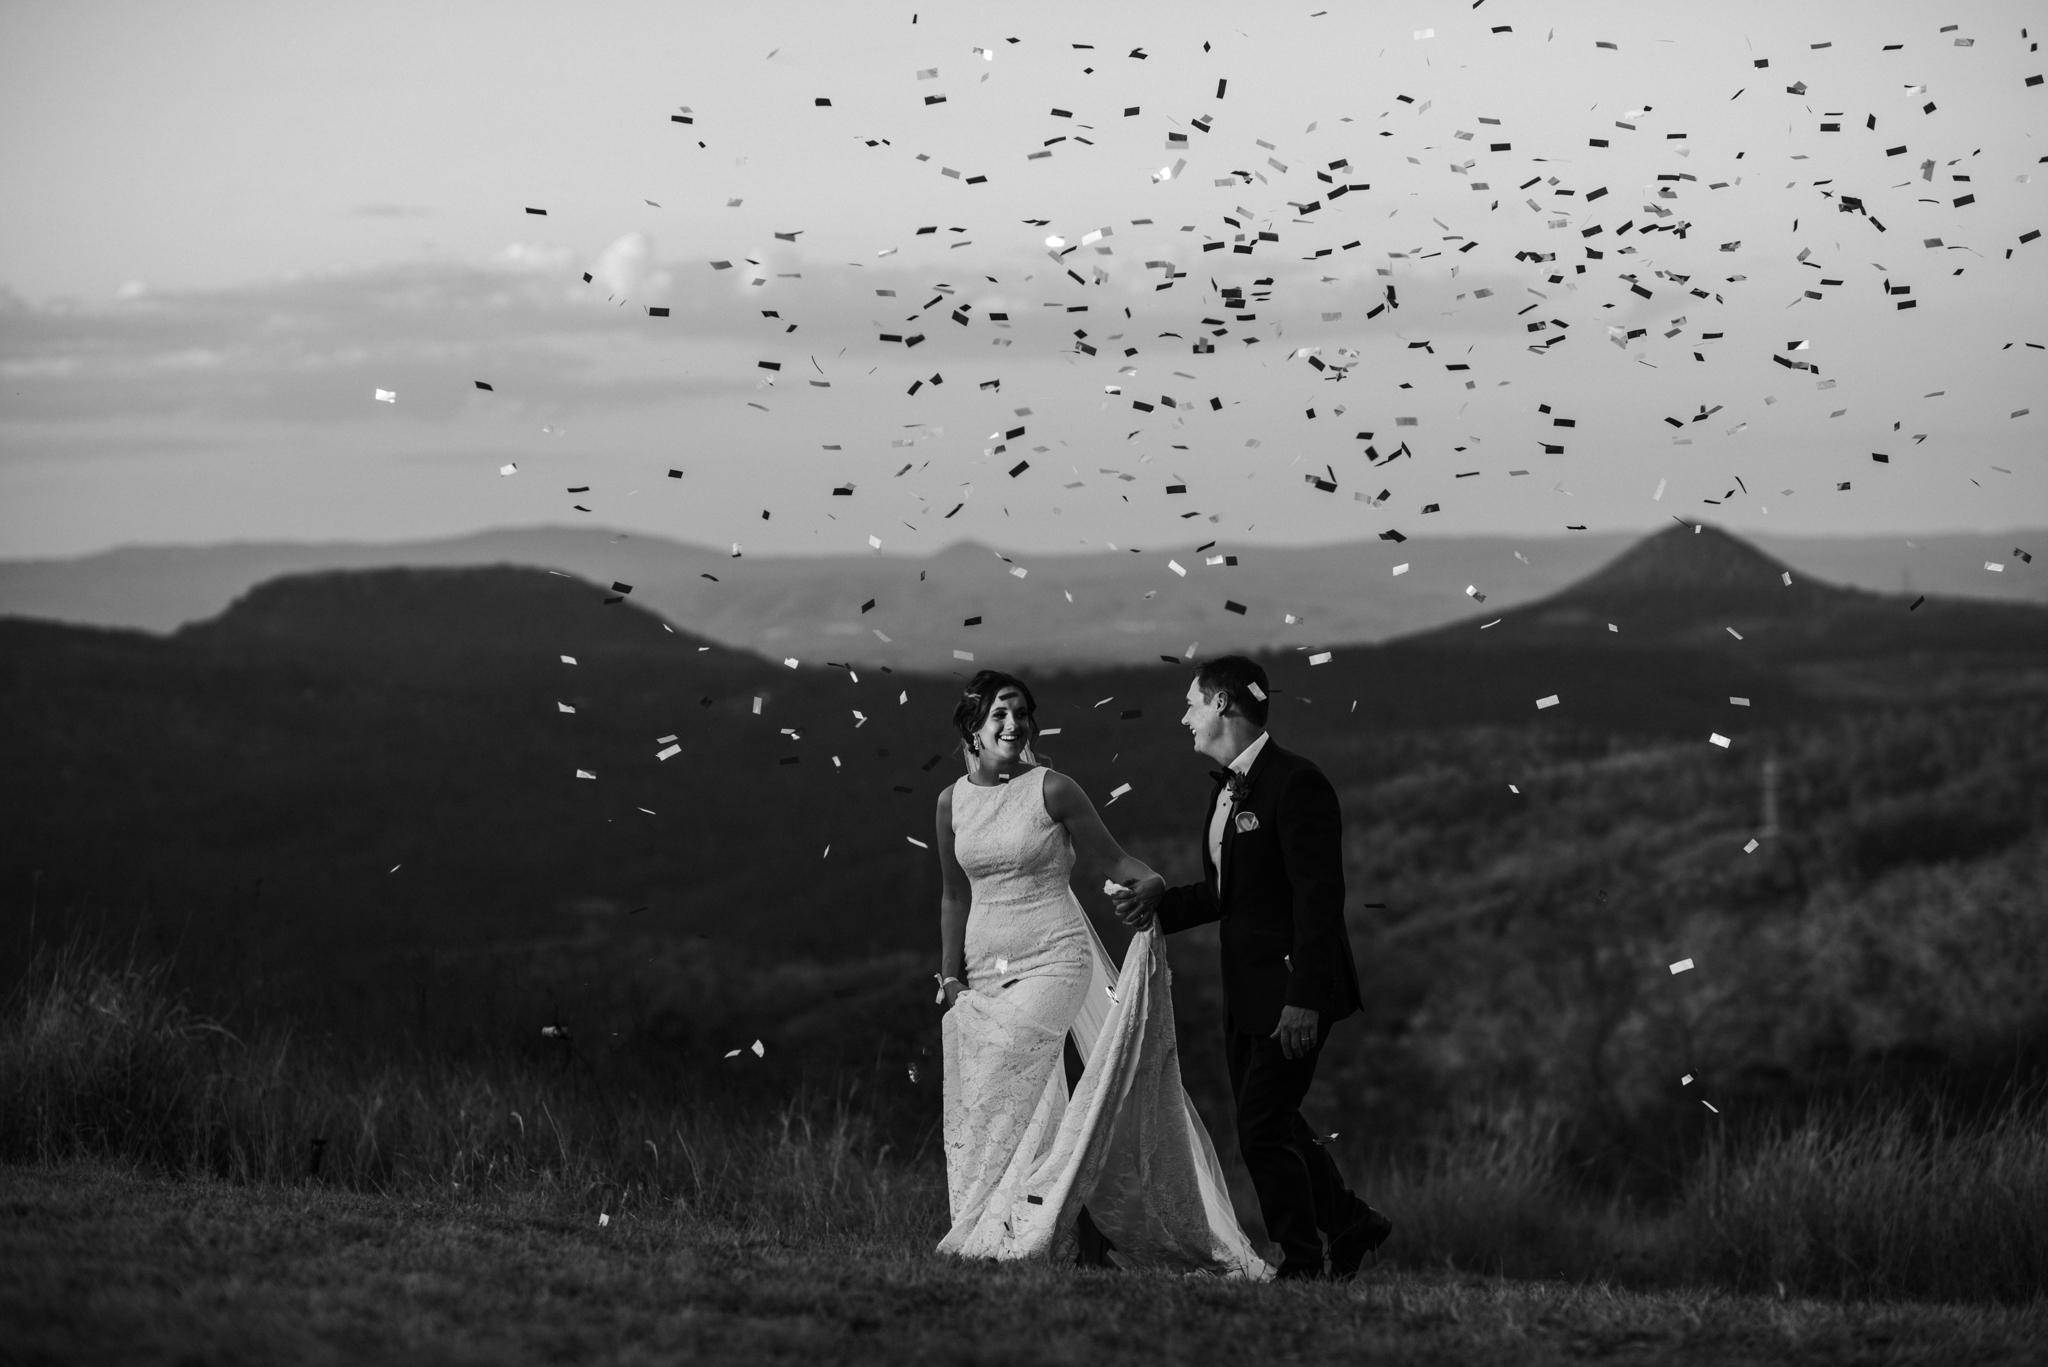 PRESTON PEAK WINERY WEDDING TOOWOOMBA • TORI + PAUL • LOVELENSCAPES PHOTOGRAPHY • 305.jpg